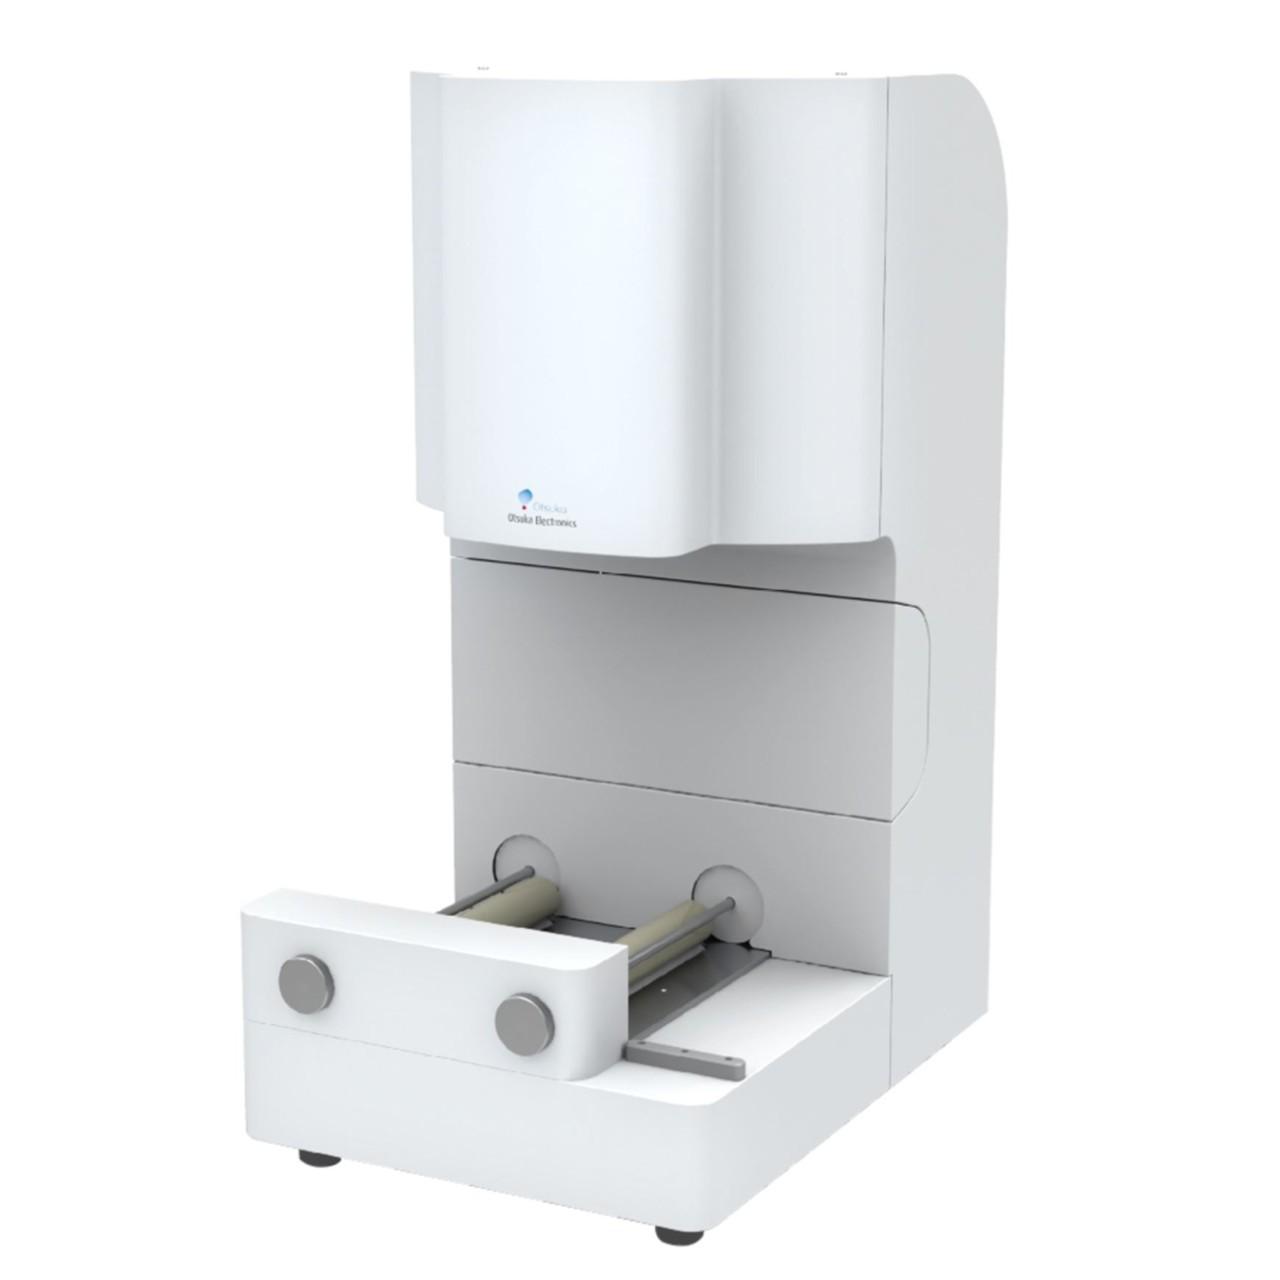 Product image: Line scanner(offline type)